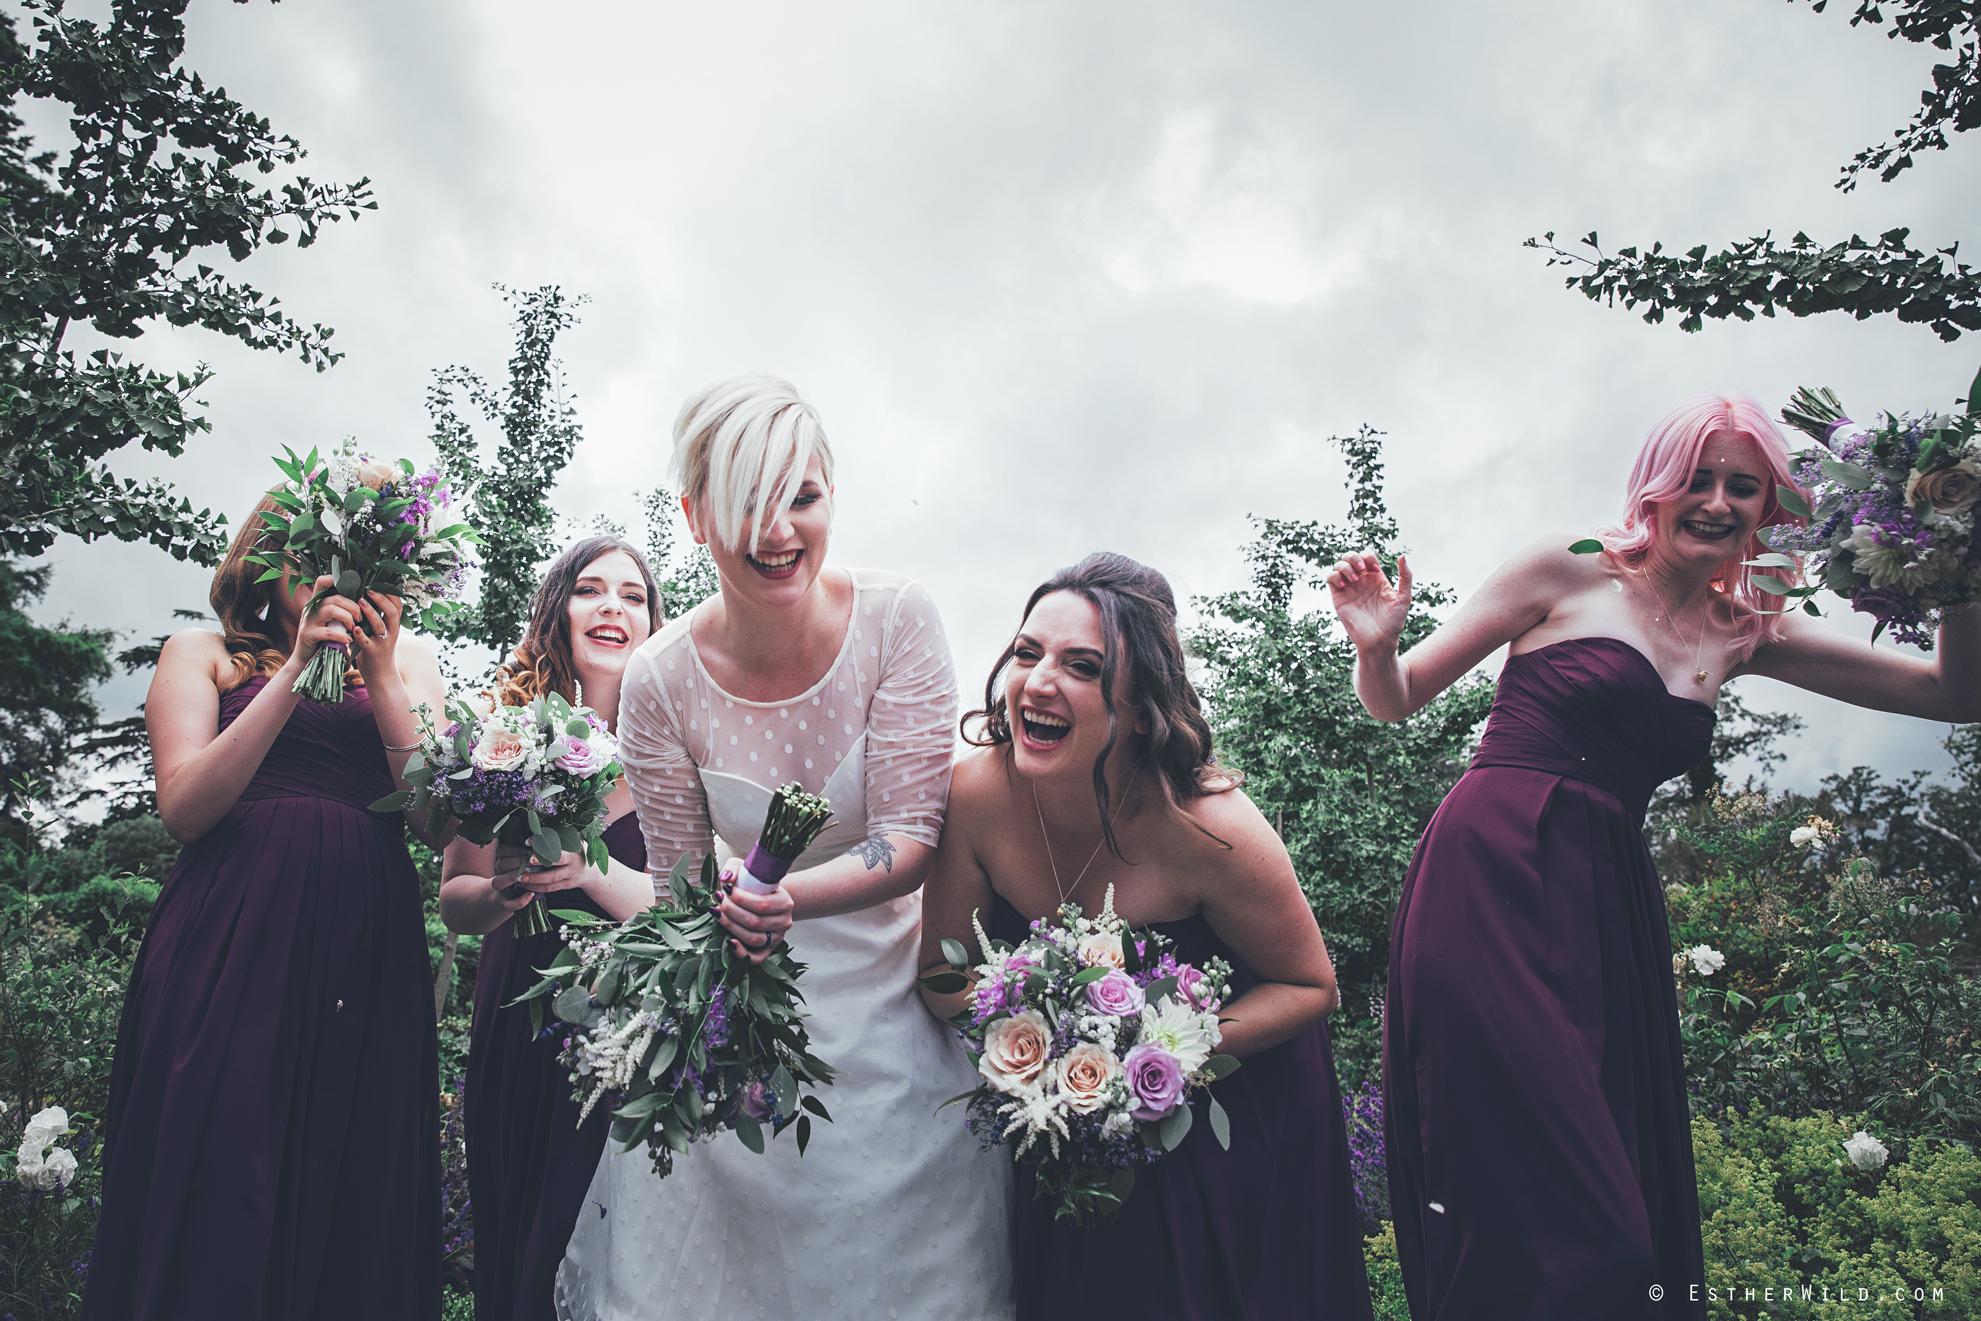 0617_London_Croydon_Clapham_Wedding_Photographer_Esther_Wild_Photography_IMG_5504.jpg